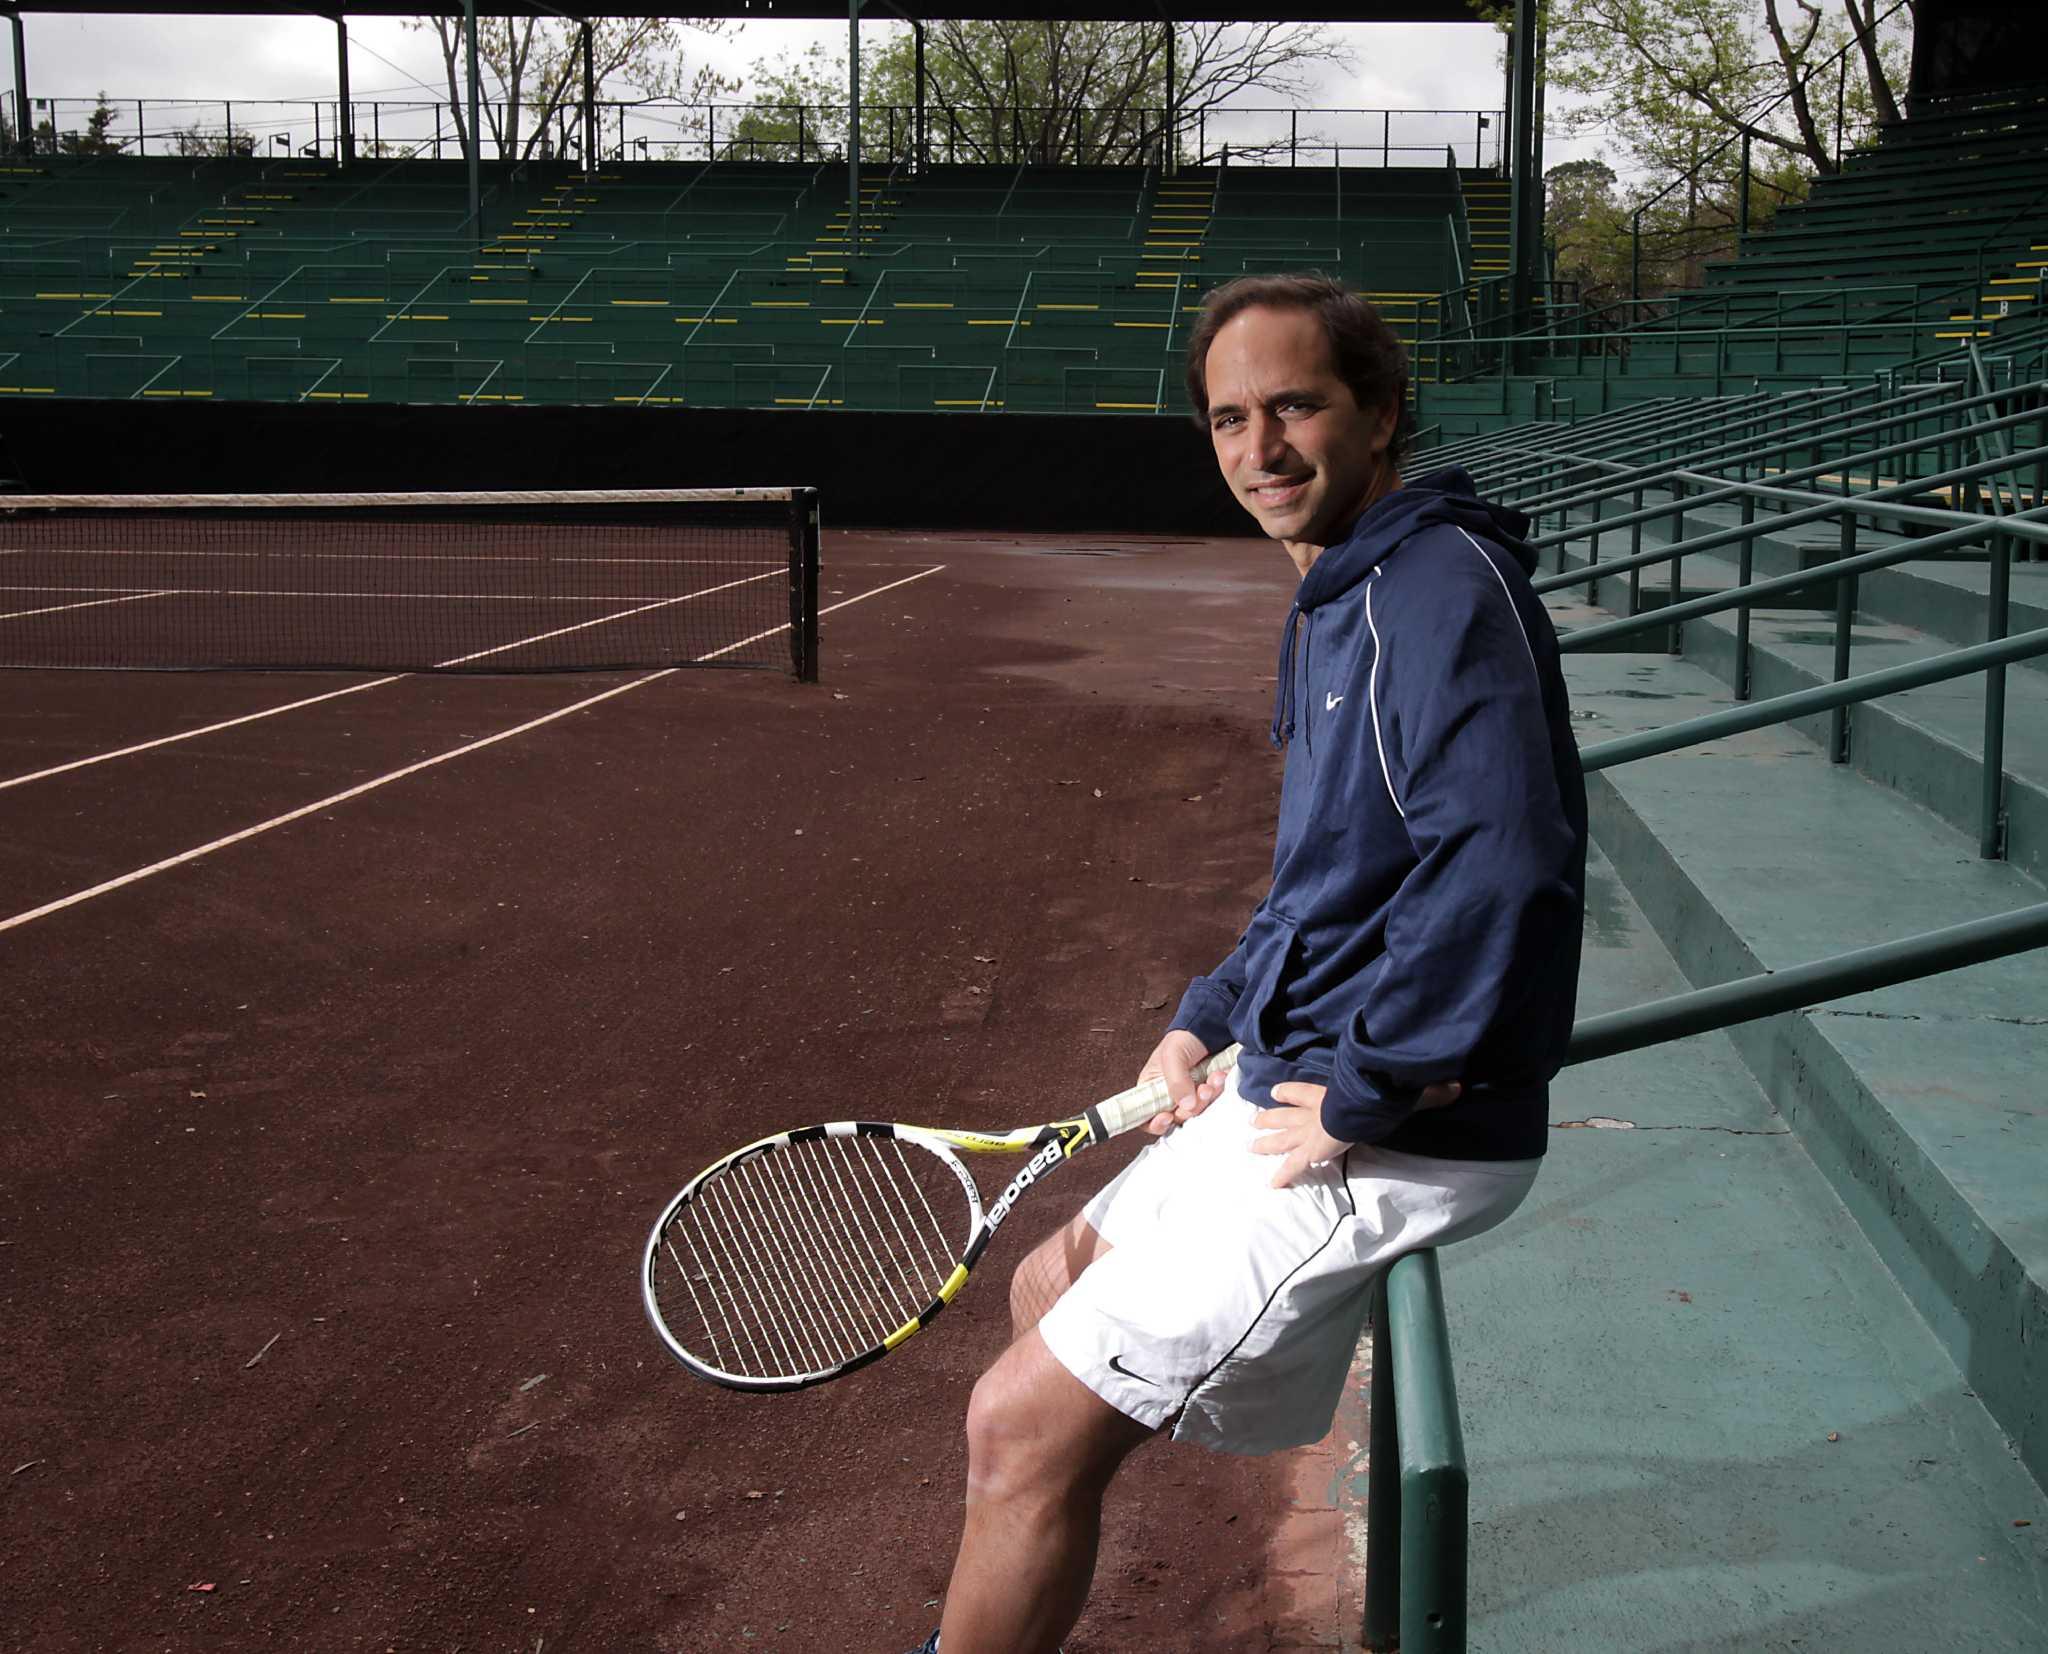 tennis River Oaks sees Giammalva e of age Houston Chronicle